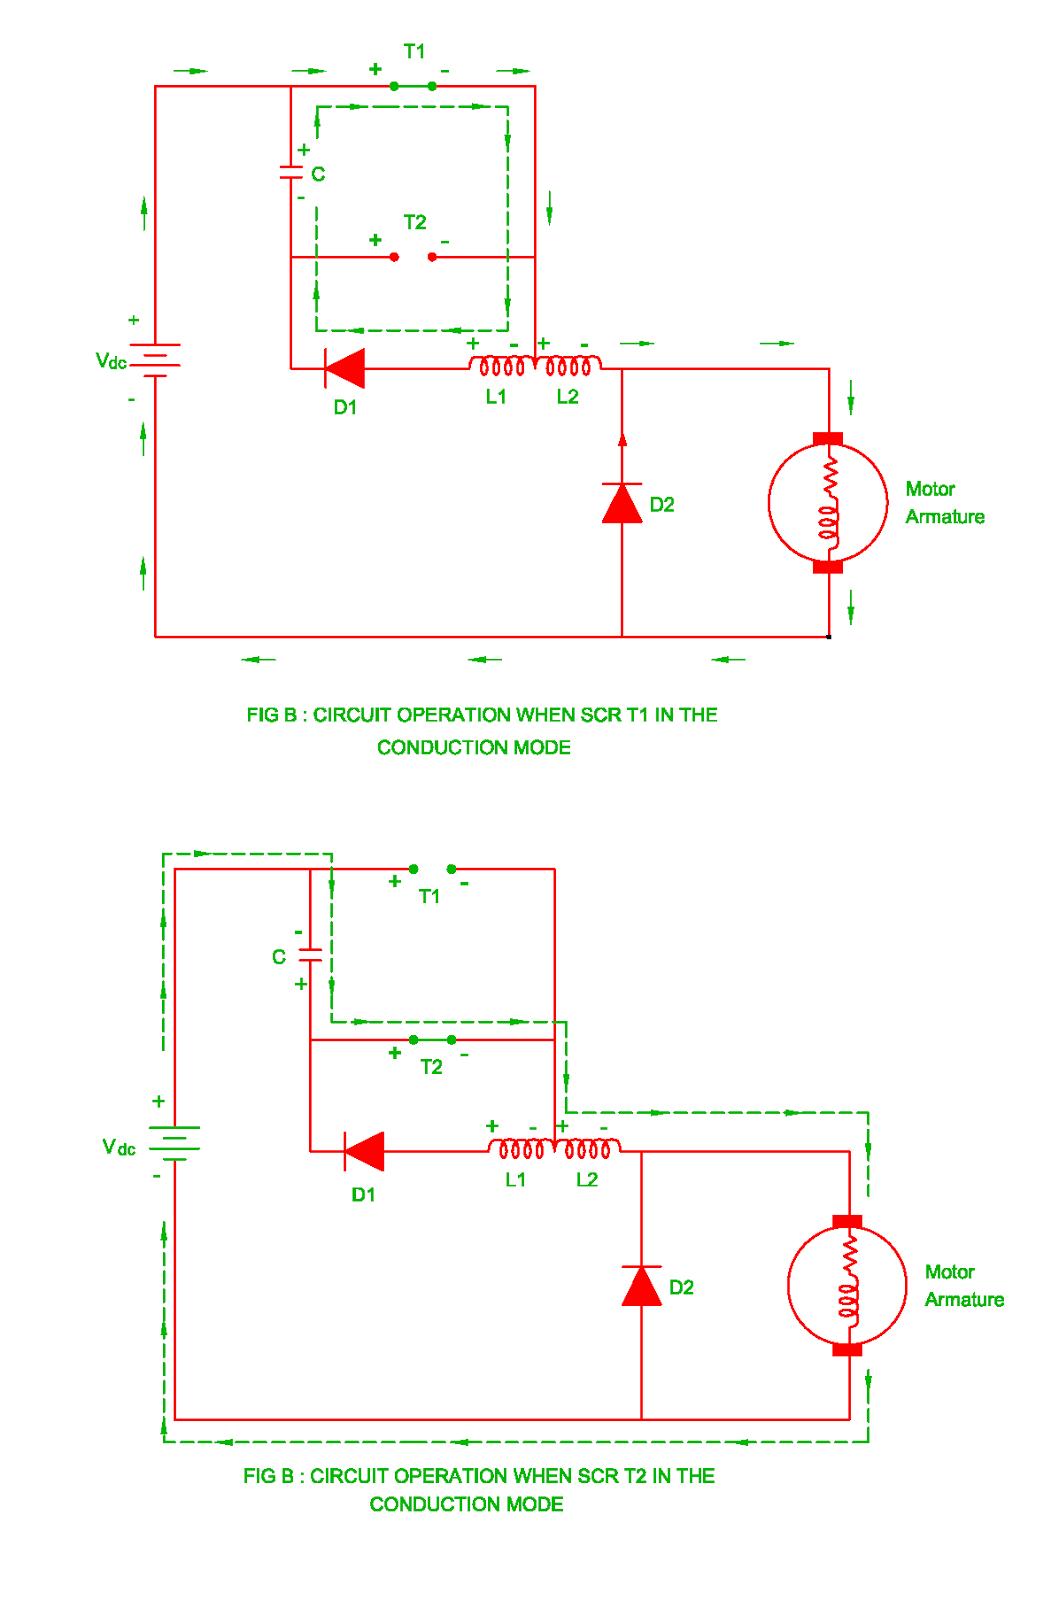 medium resolution of jones chopper electrical revolution v rod diagram circuit diagram jones chopper